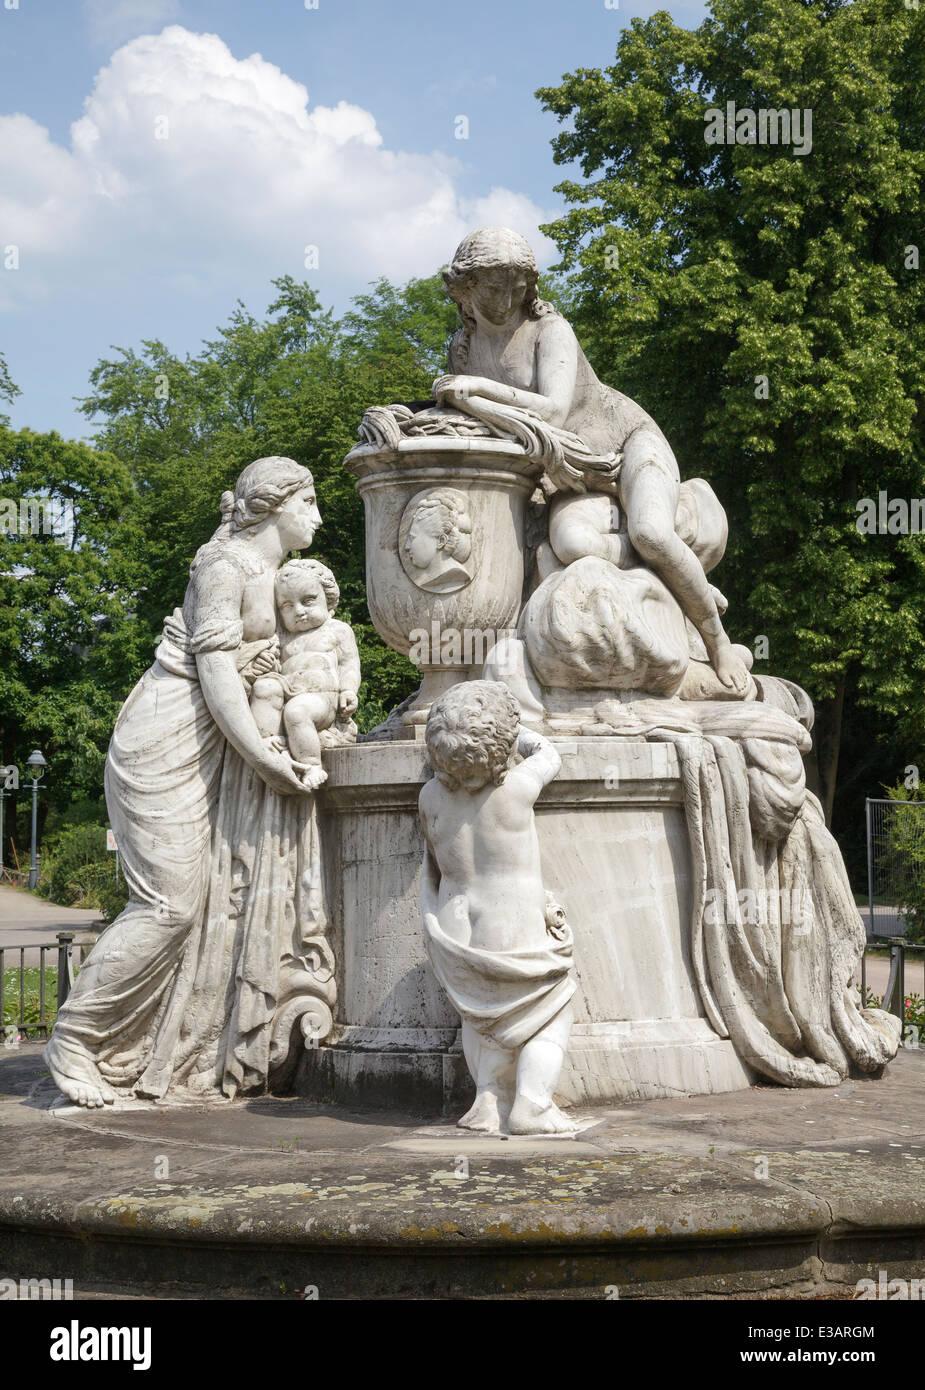 CarolineMatildaMonumentin the French Garden, Celle, Lower Saxony, Germany - Stock Image